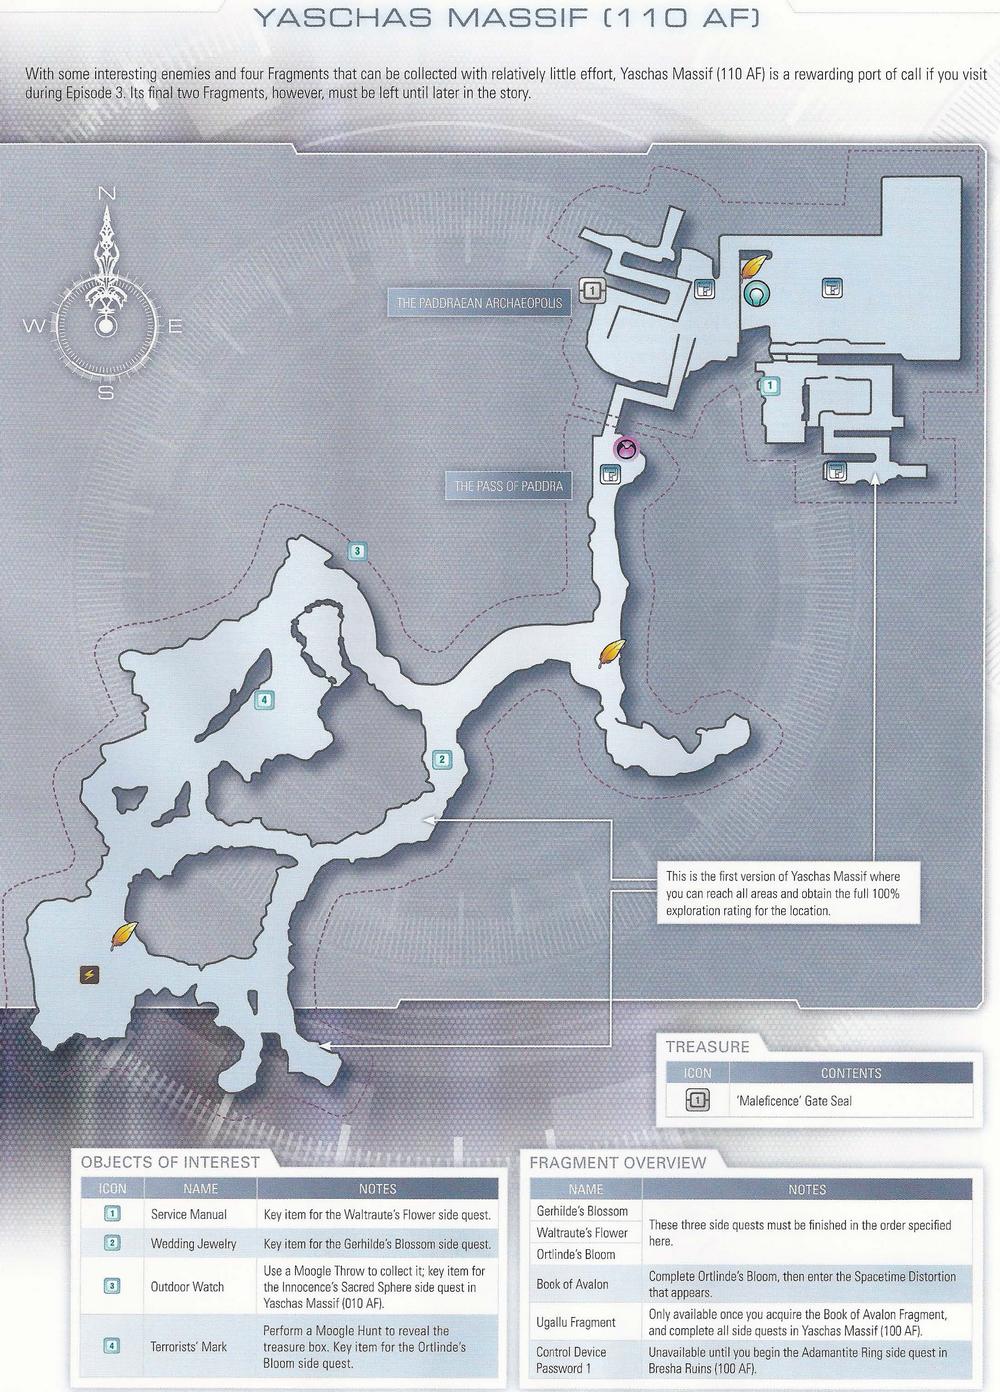 Final Fantasy Xiii 2 Yaschas Massif 110 Af